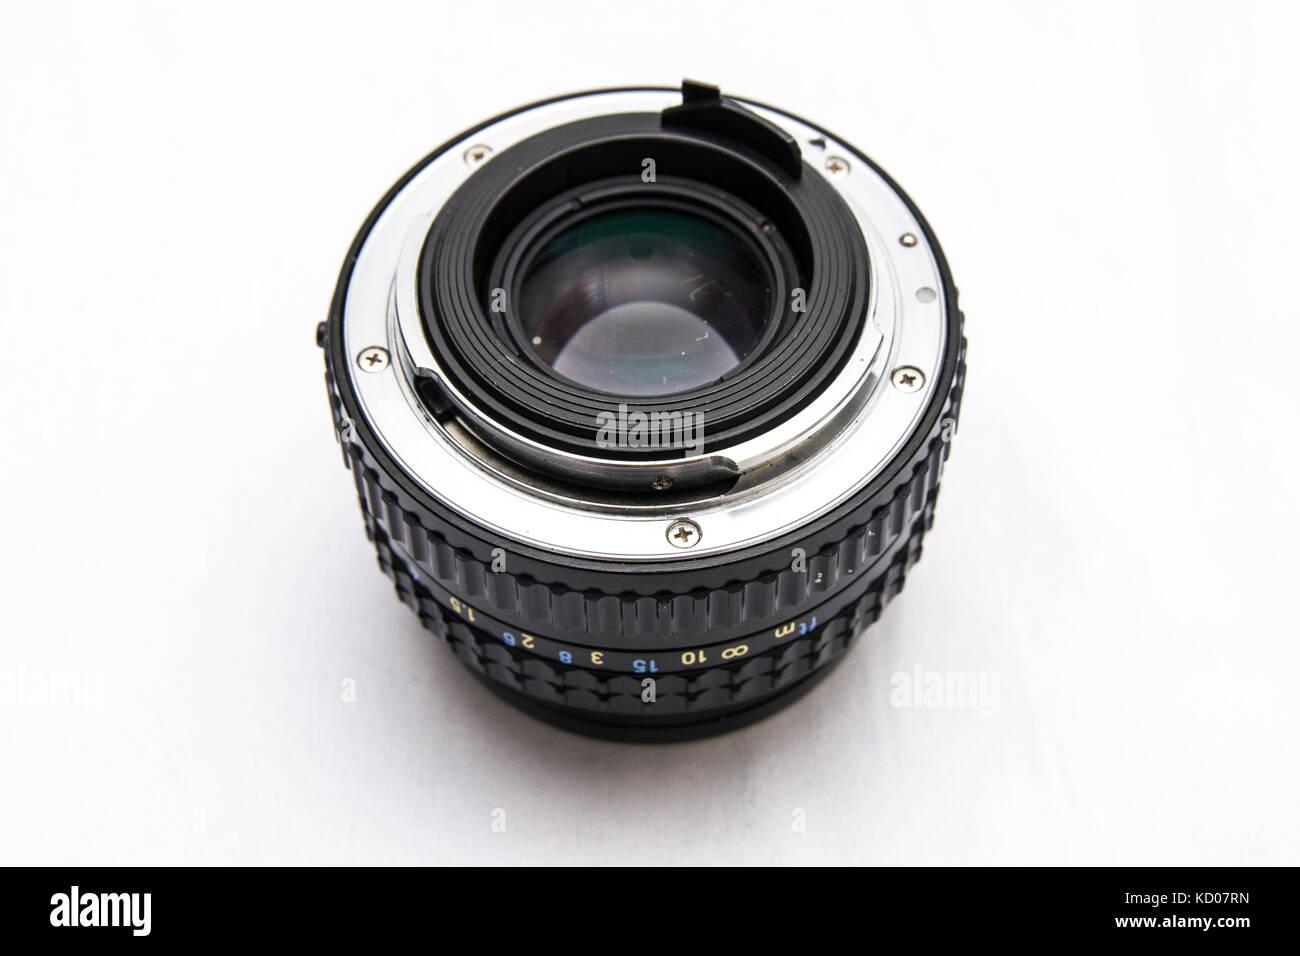 Pentax SMC 50mm f/1.7 Objektiv mit fester Brennweite. Vintage Objektive, manueller Fokus, automatische Blende. Nette Stockbild